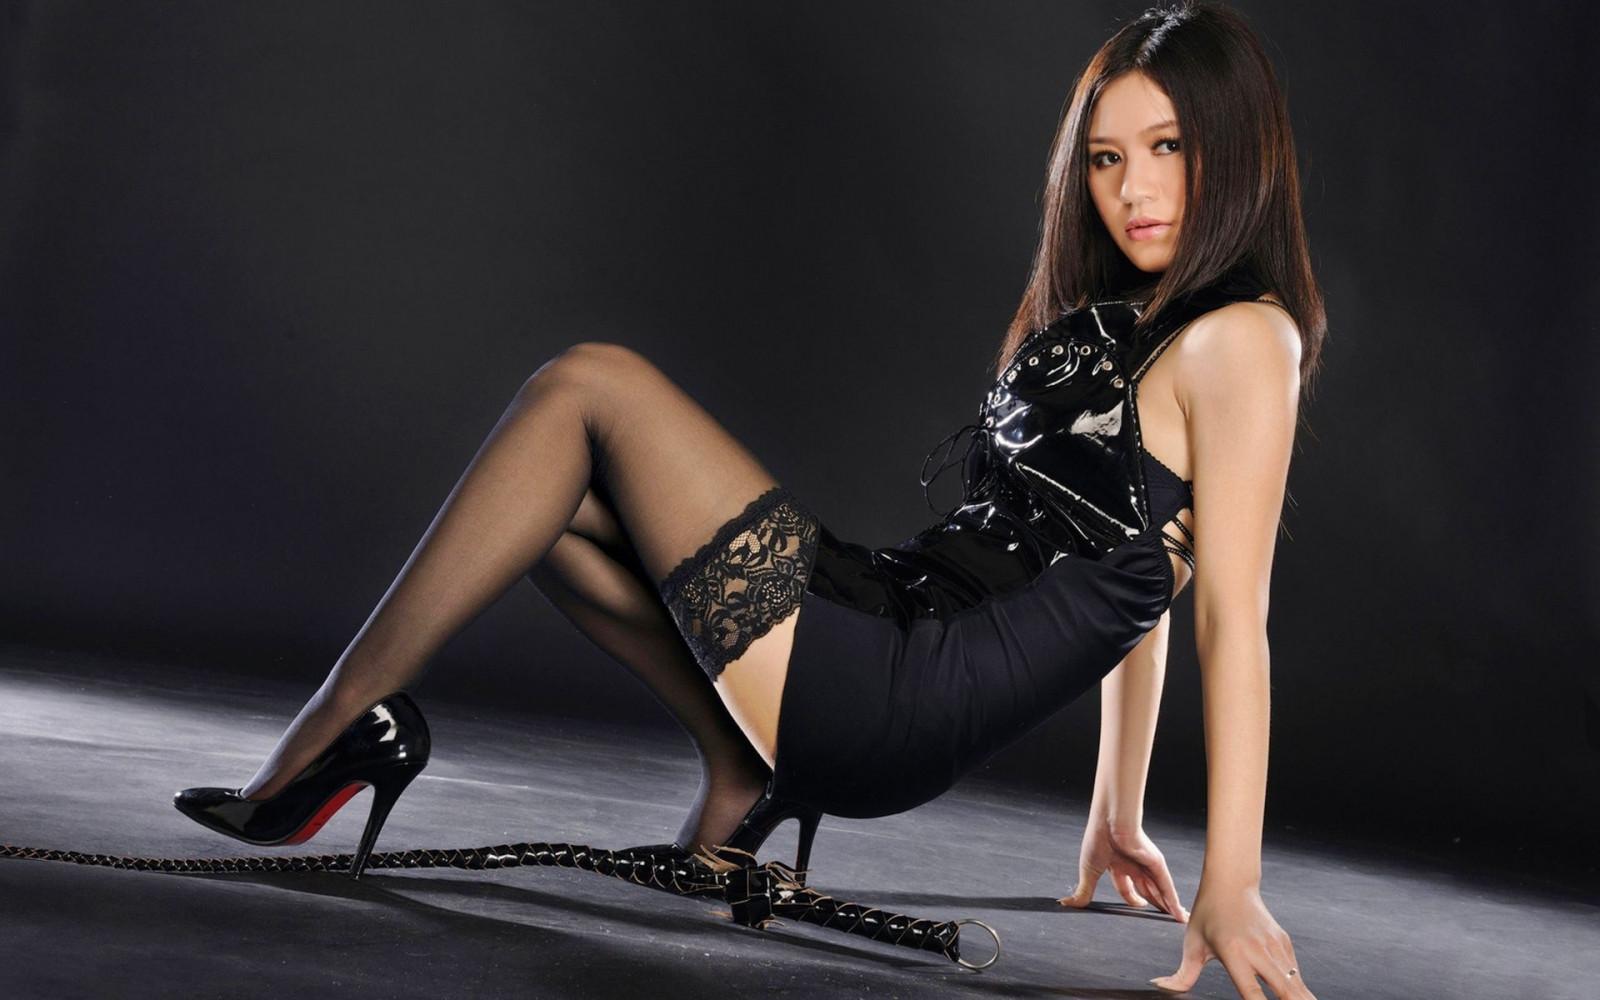 картинки китаянки красивых девушек чулках